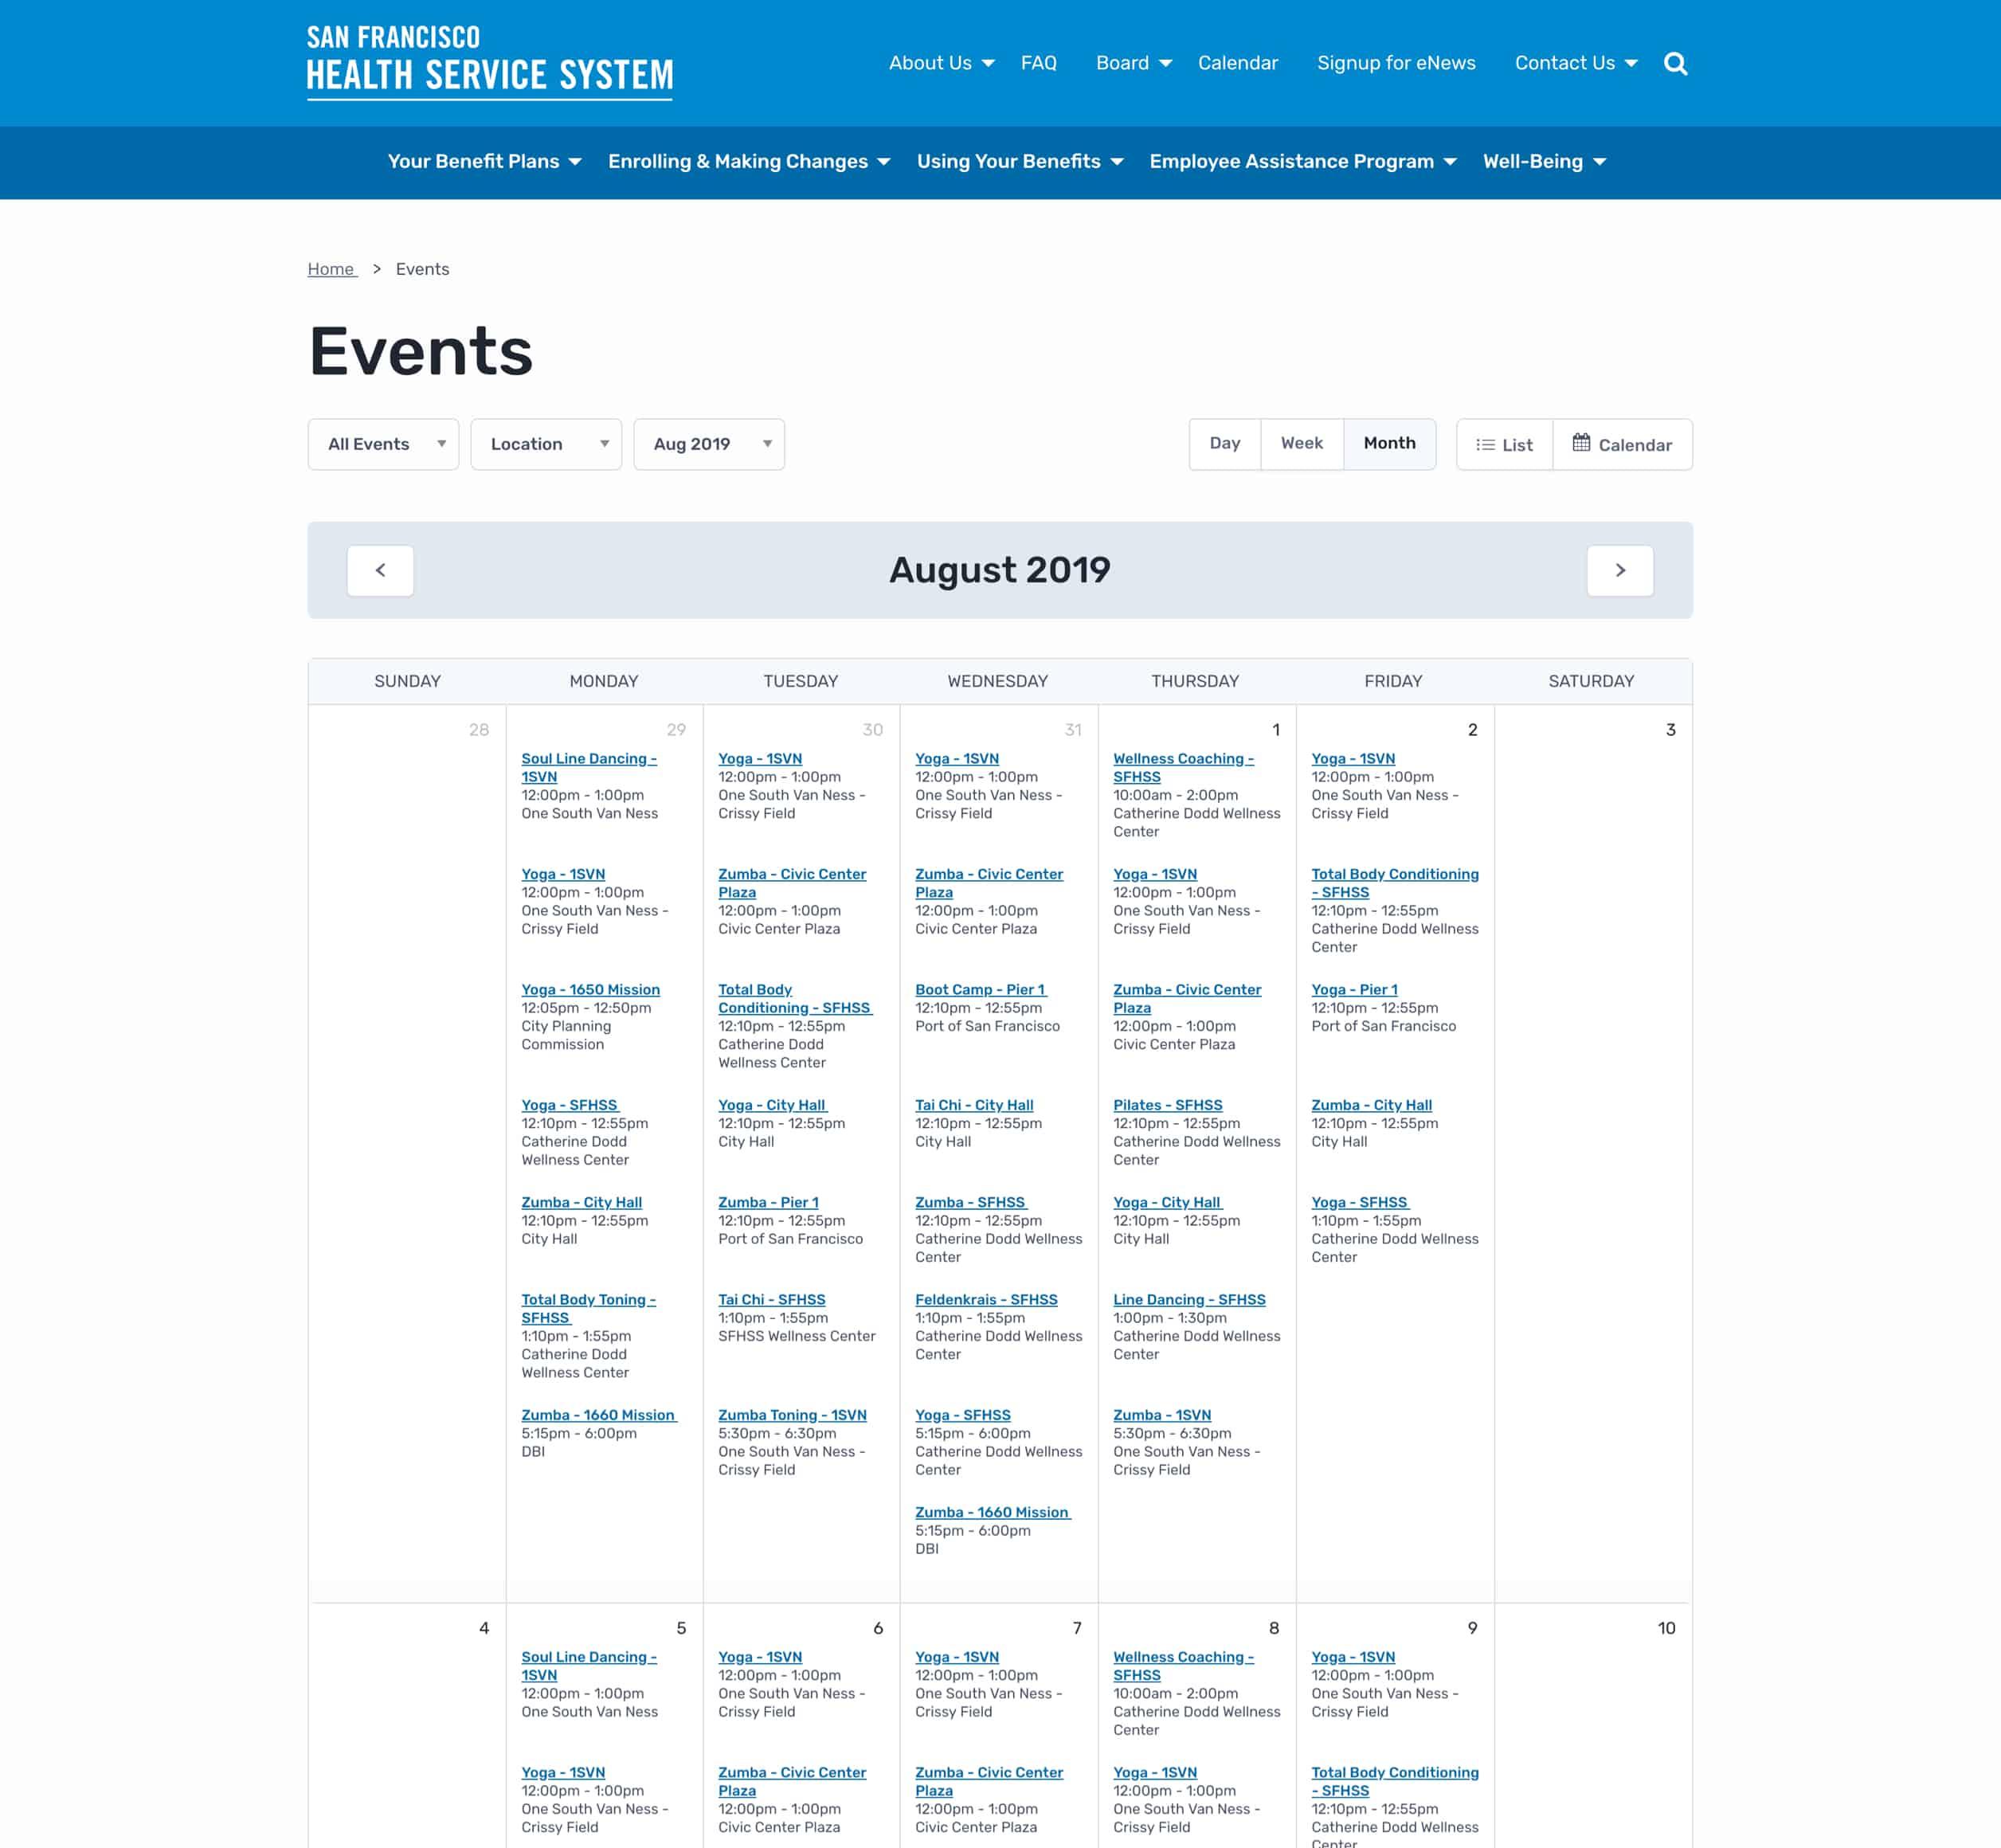 A screenshot of San Francisco's Heath Service System's online calendar of events, a Kanopi Studios case study.